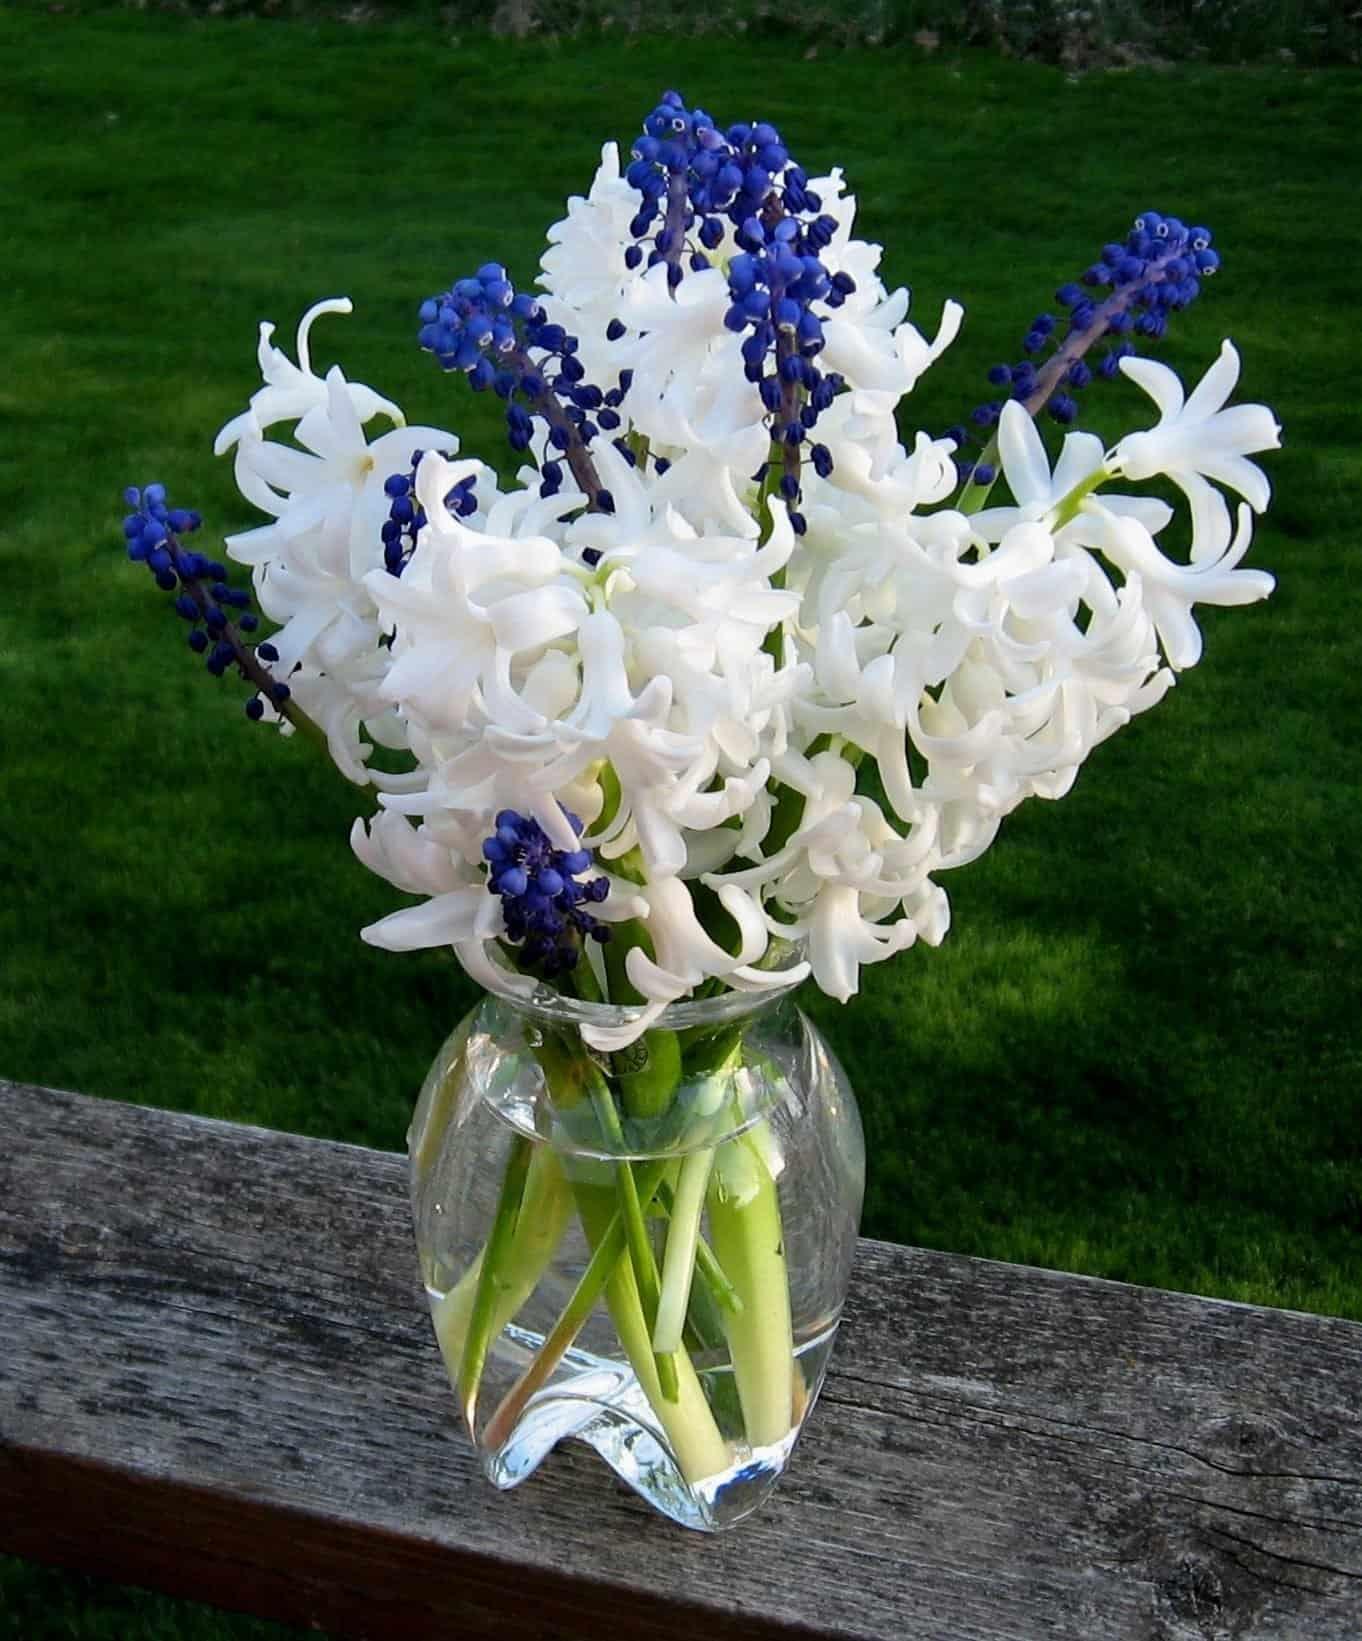 White hyacinths with grape hyacinths